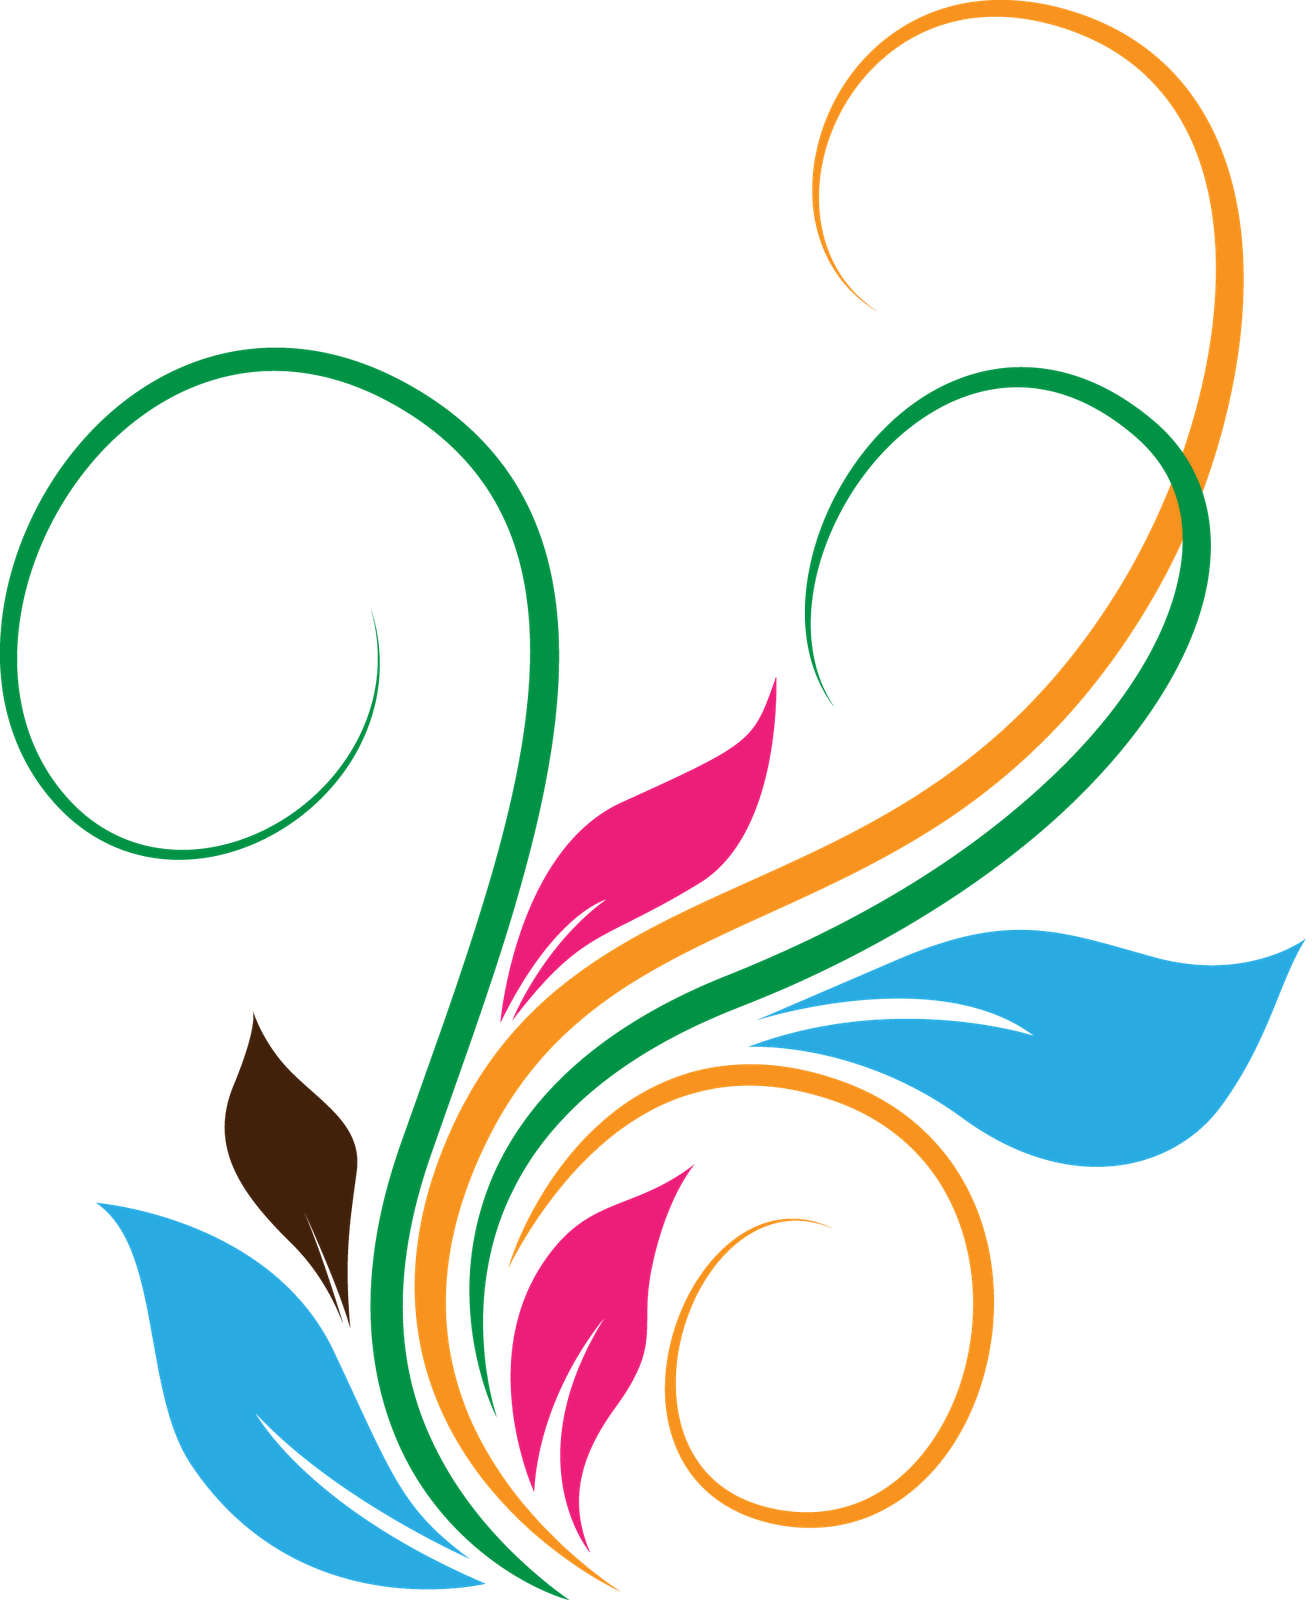 download design clipart hq png image freepngimg single swirl line clip art Line Dividers Clip Art